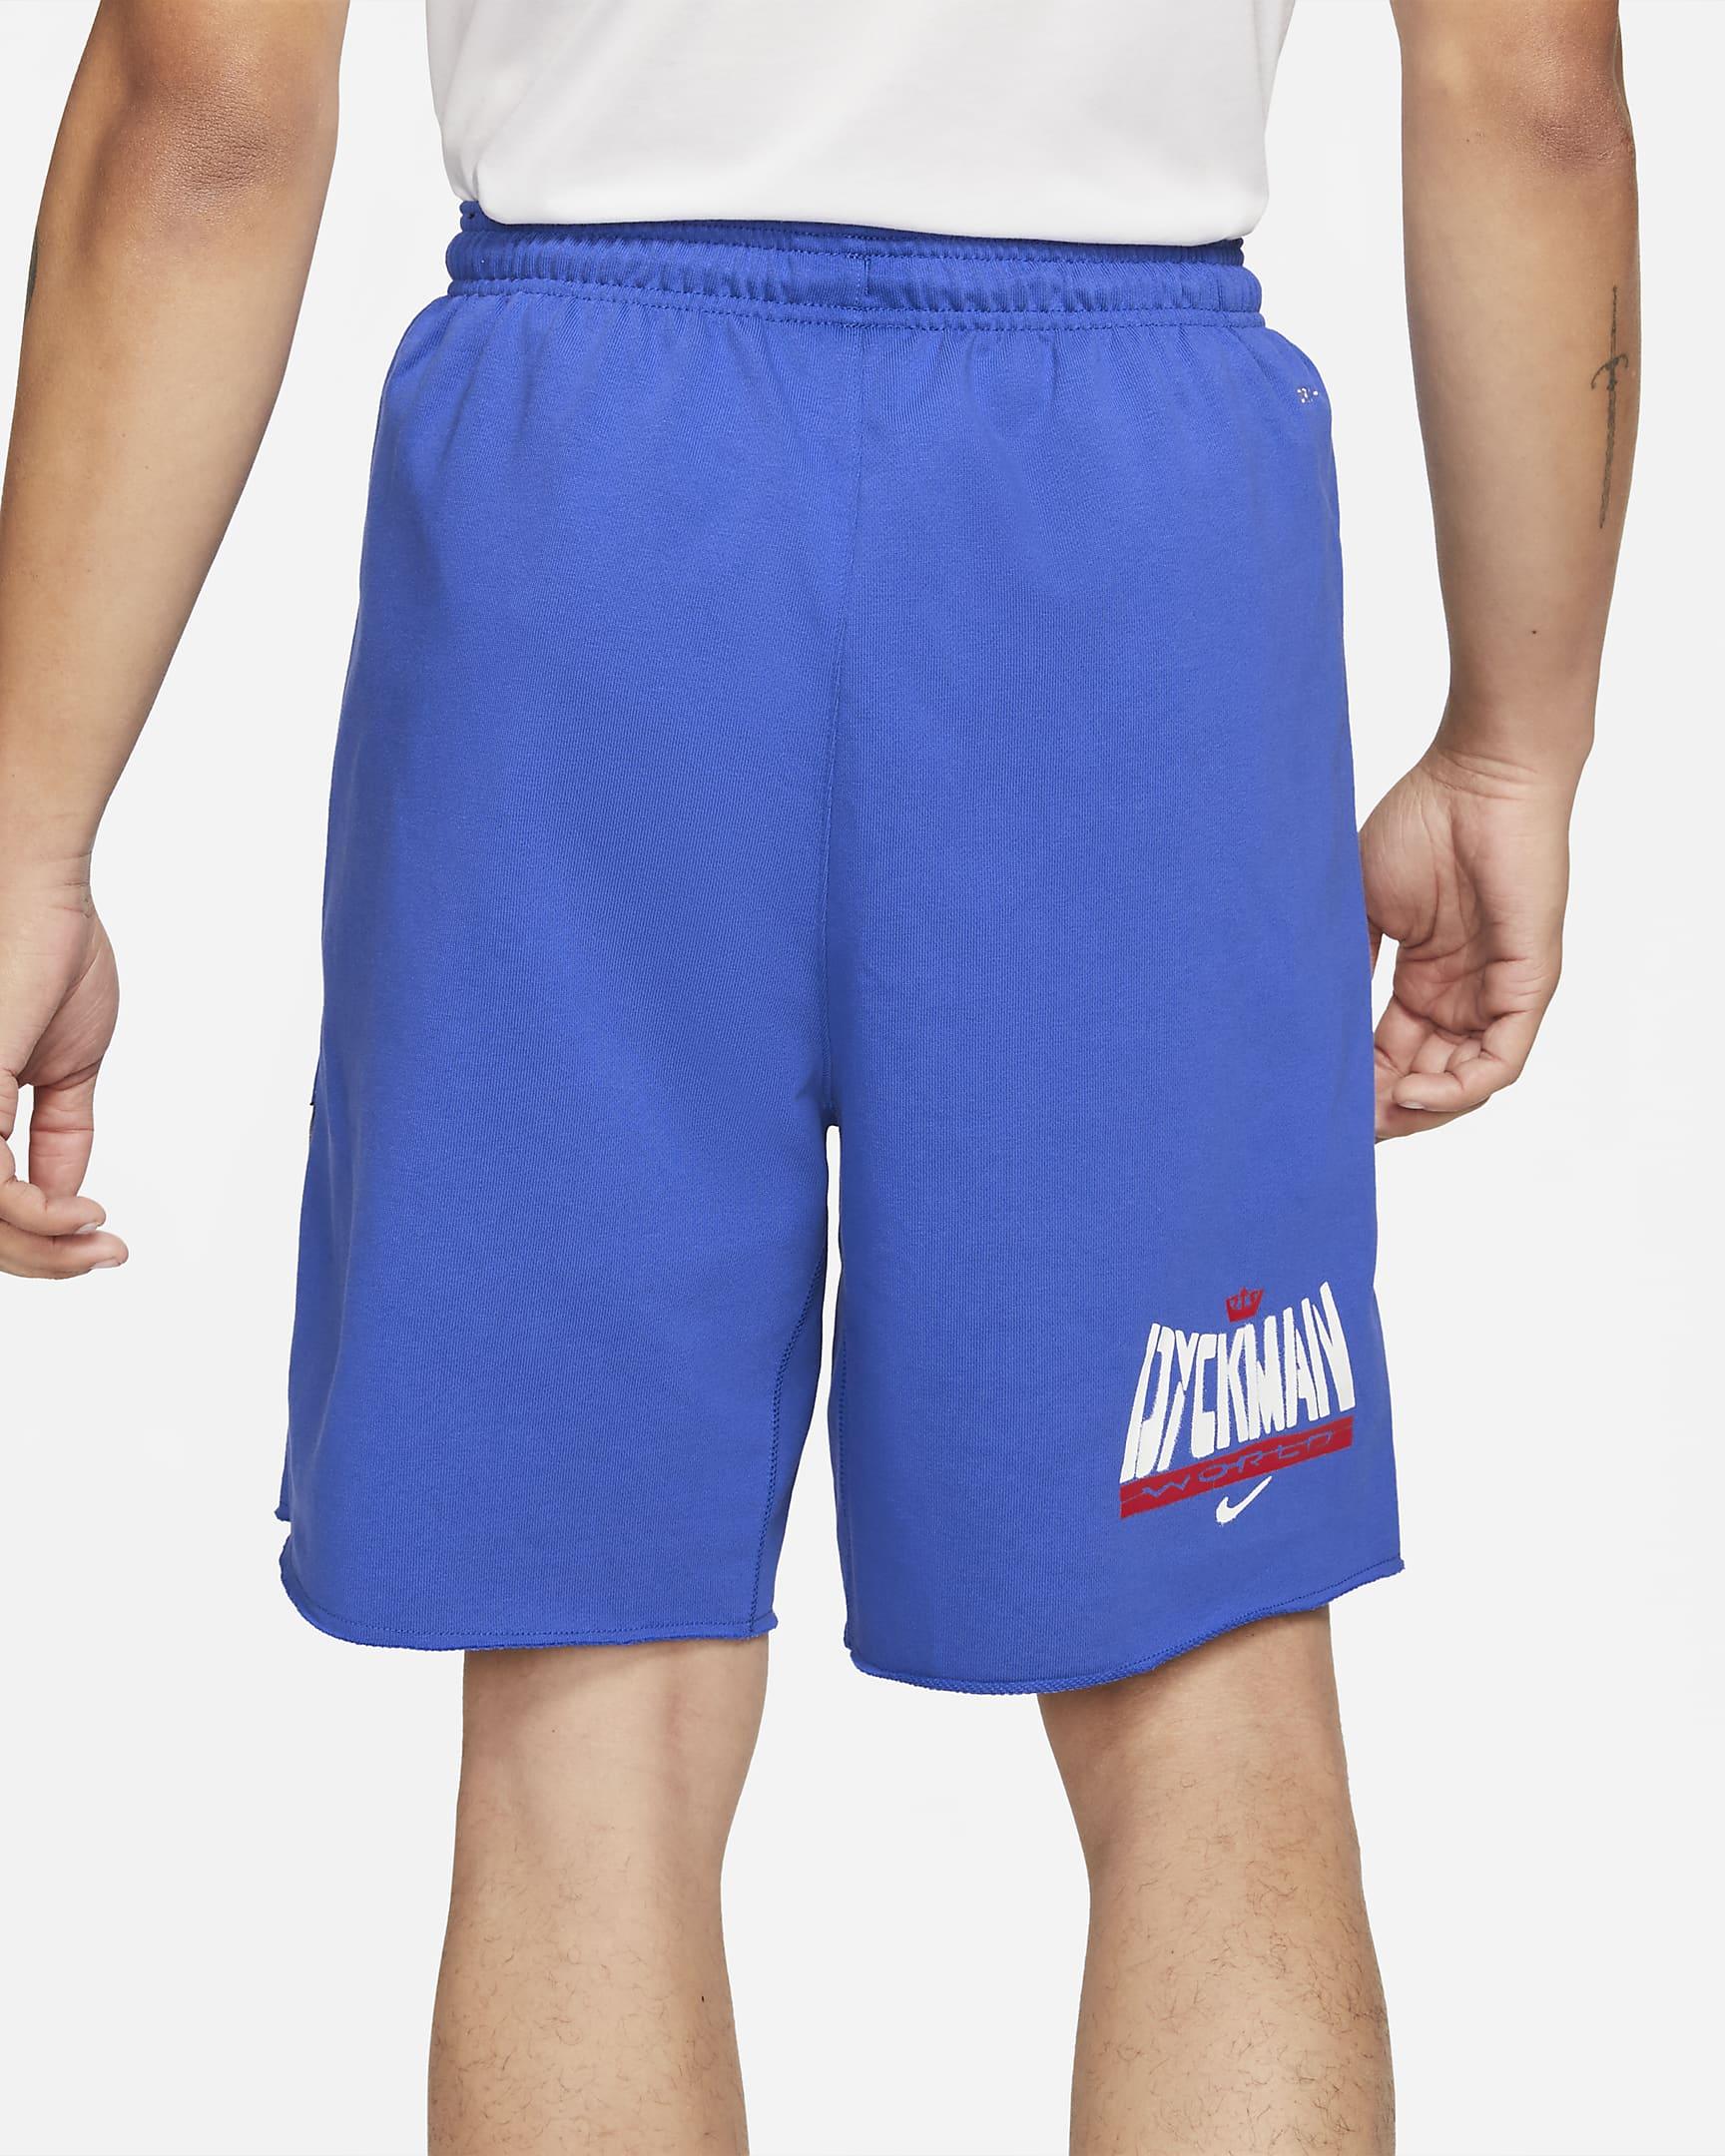 standard-issue-dyckman-mens-basketball-fleece-shorts-BwjwhC-2.png